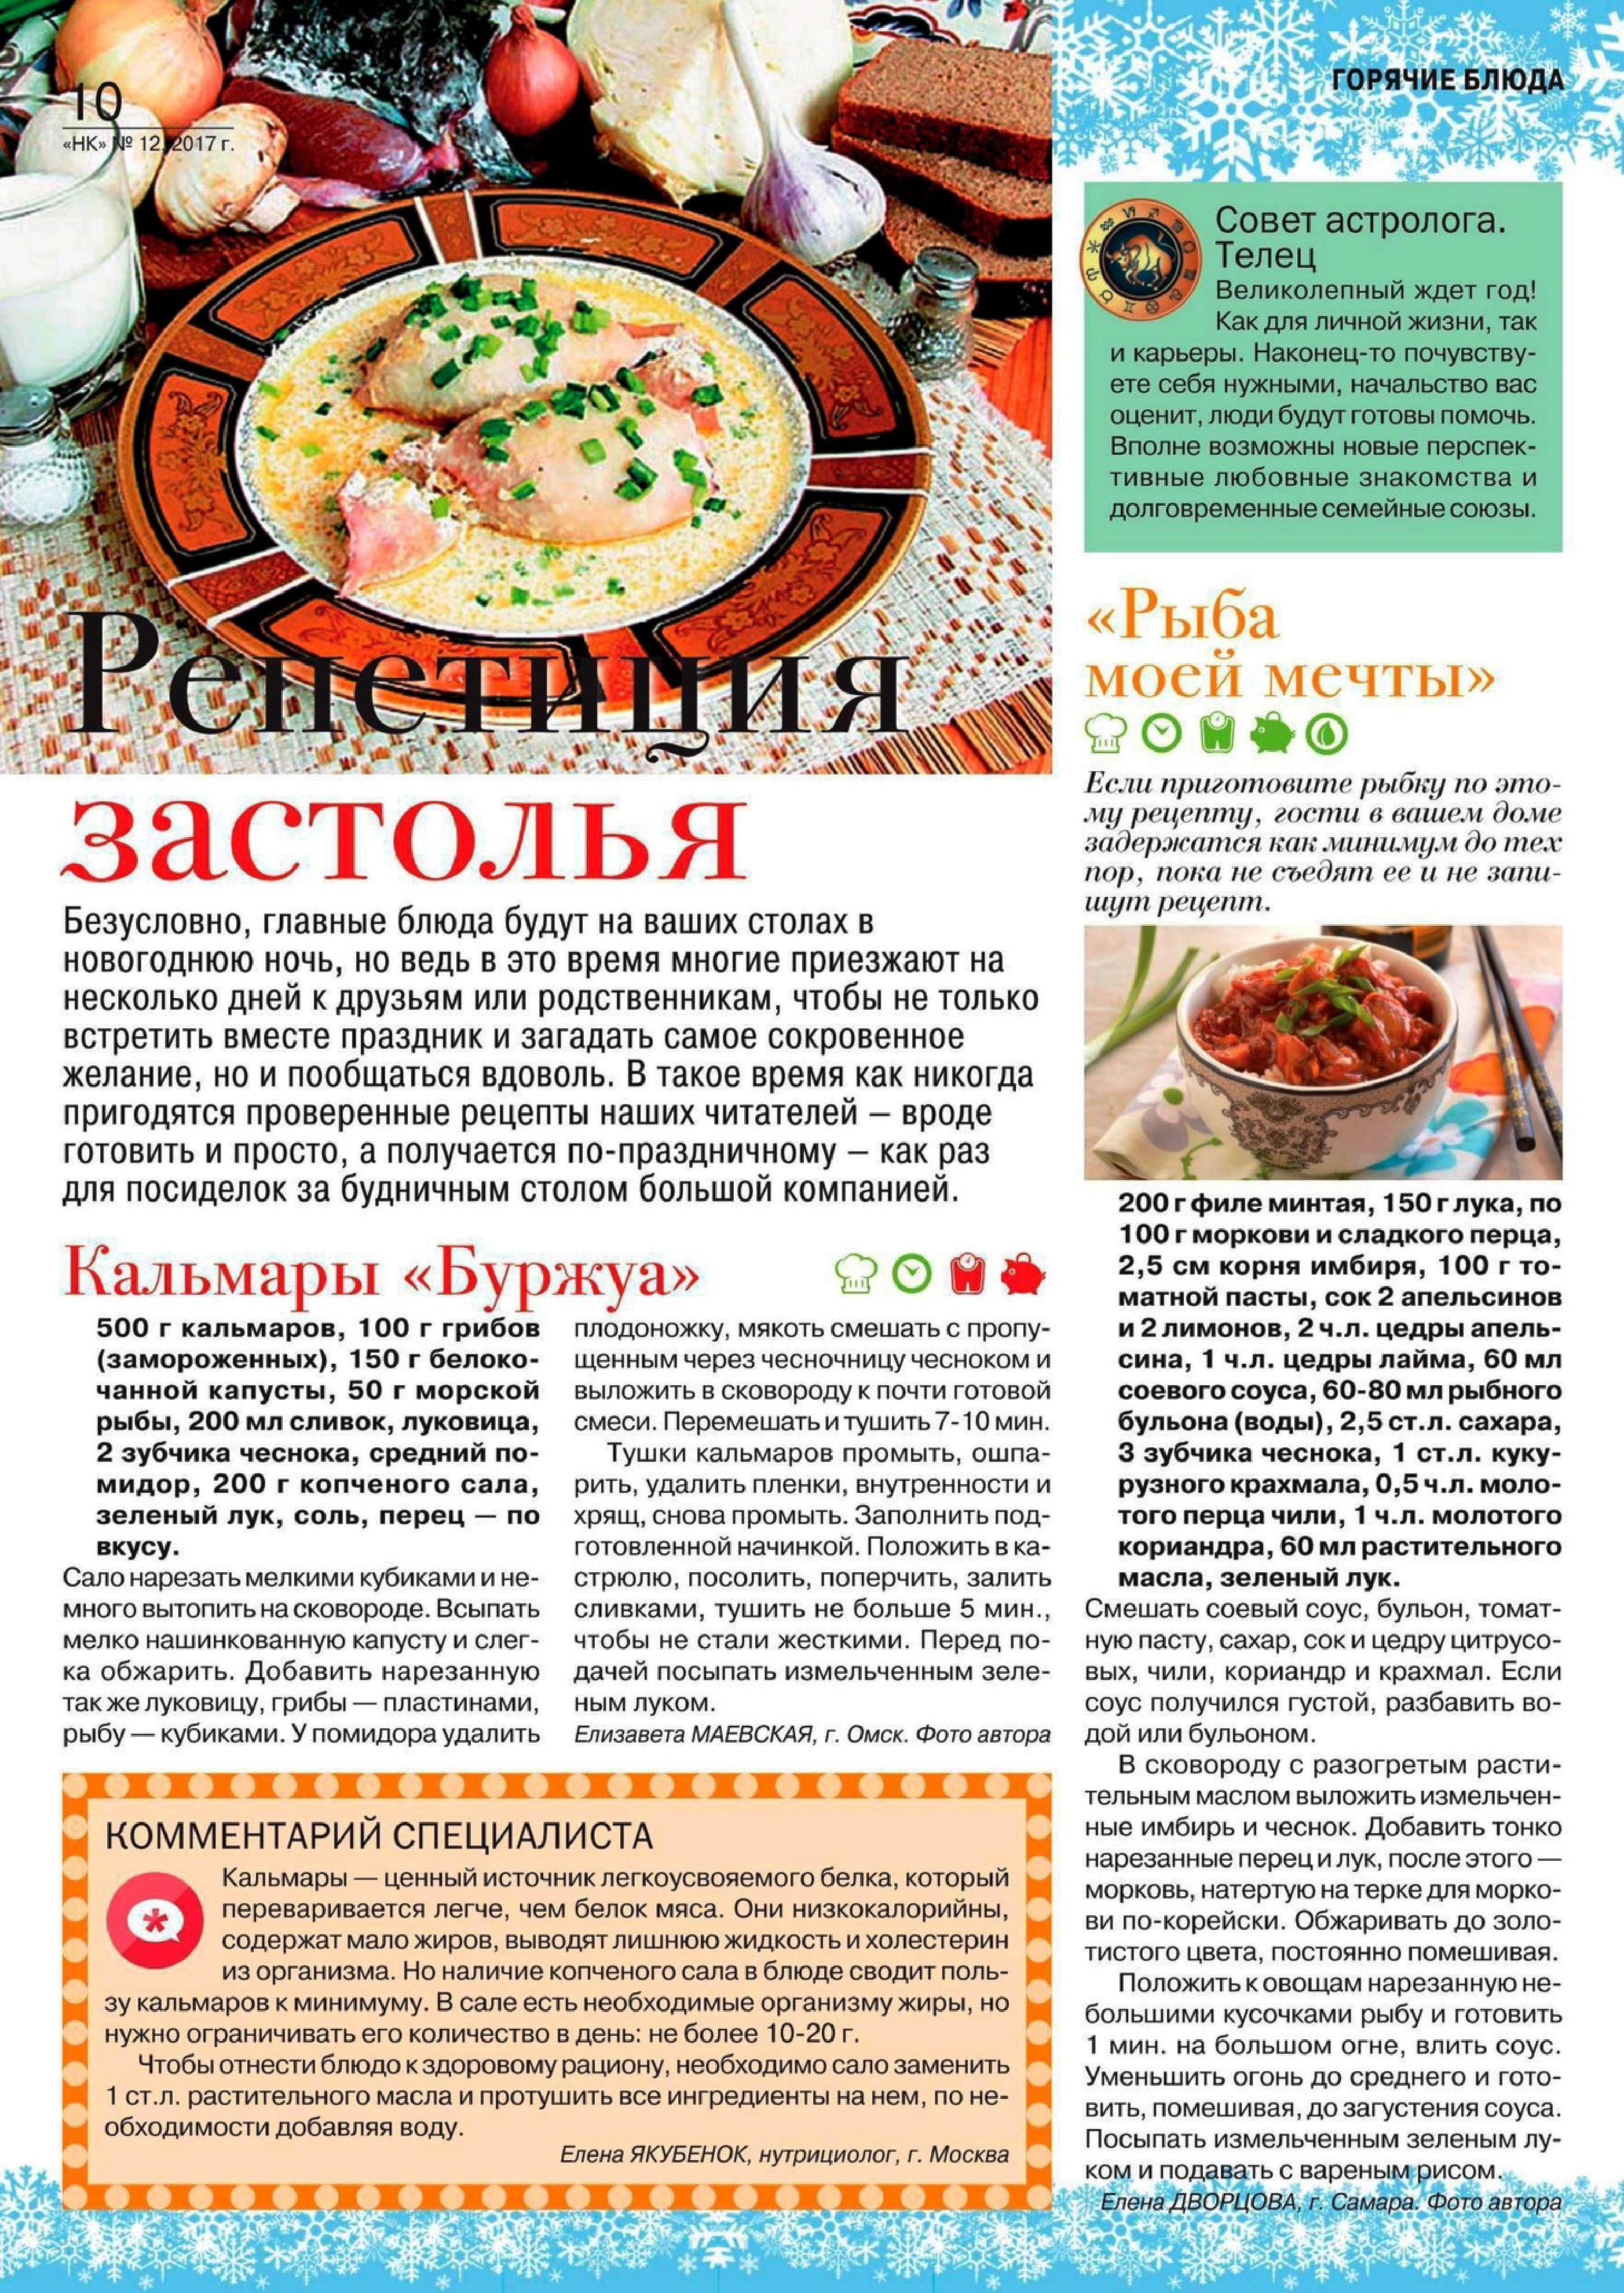 Рецепты для начальства — 8